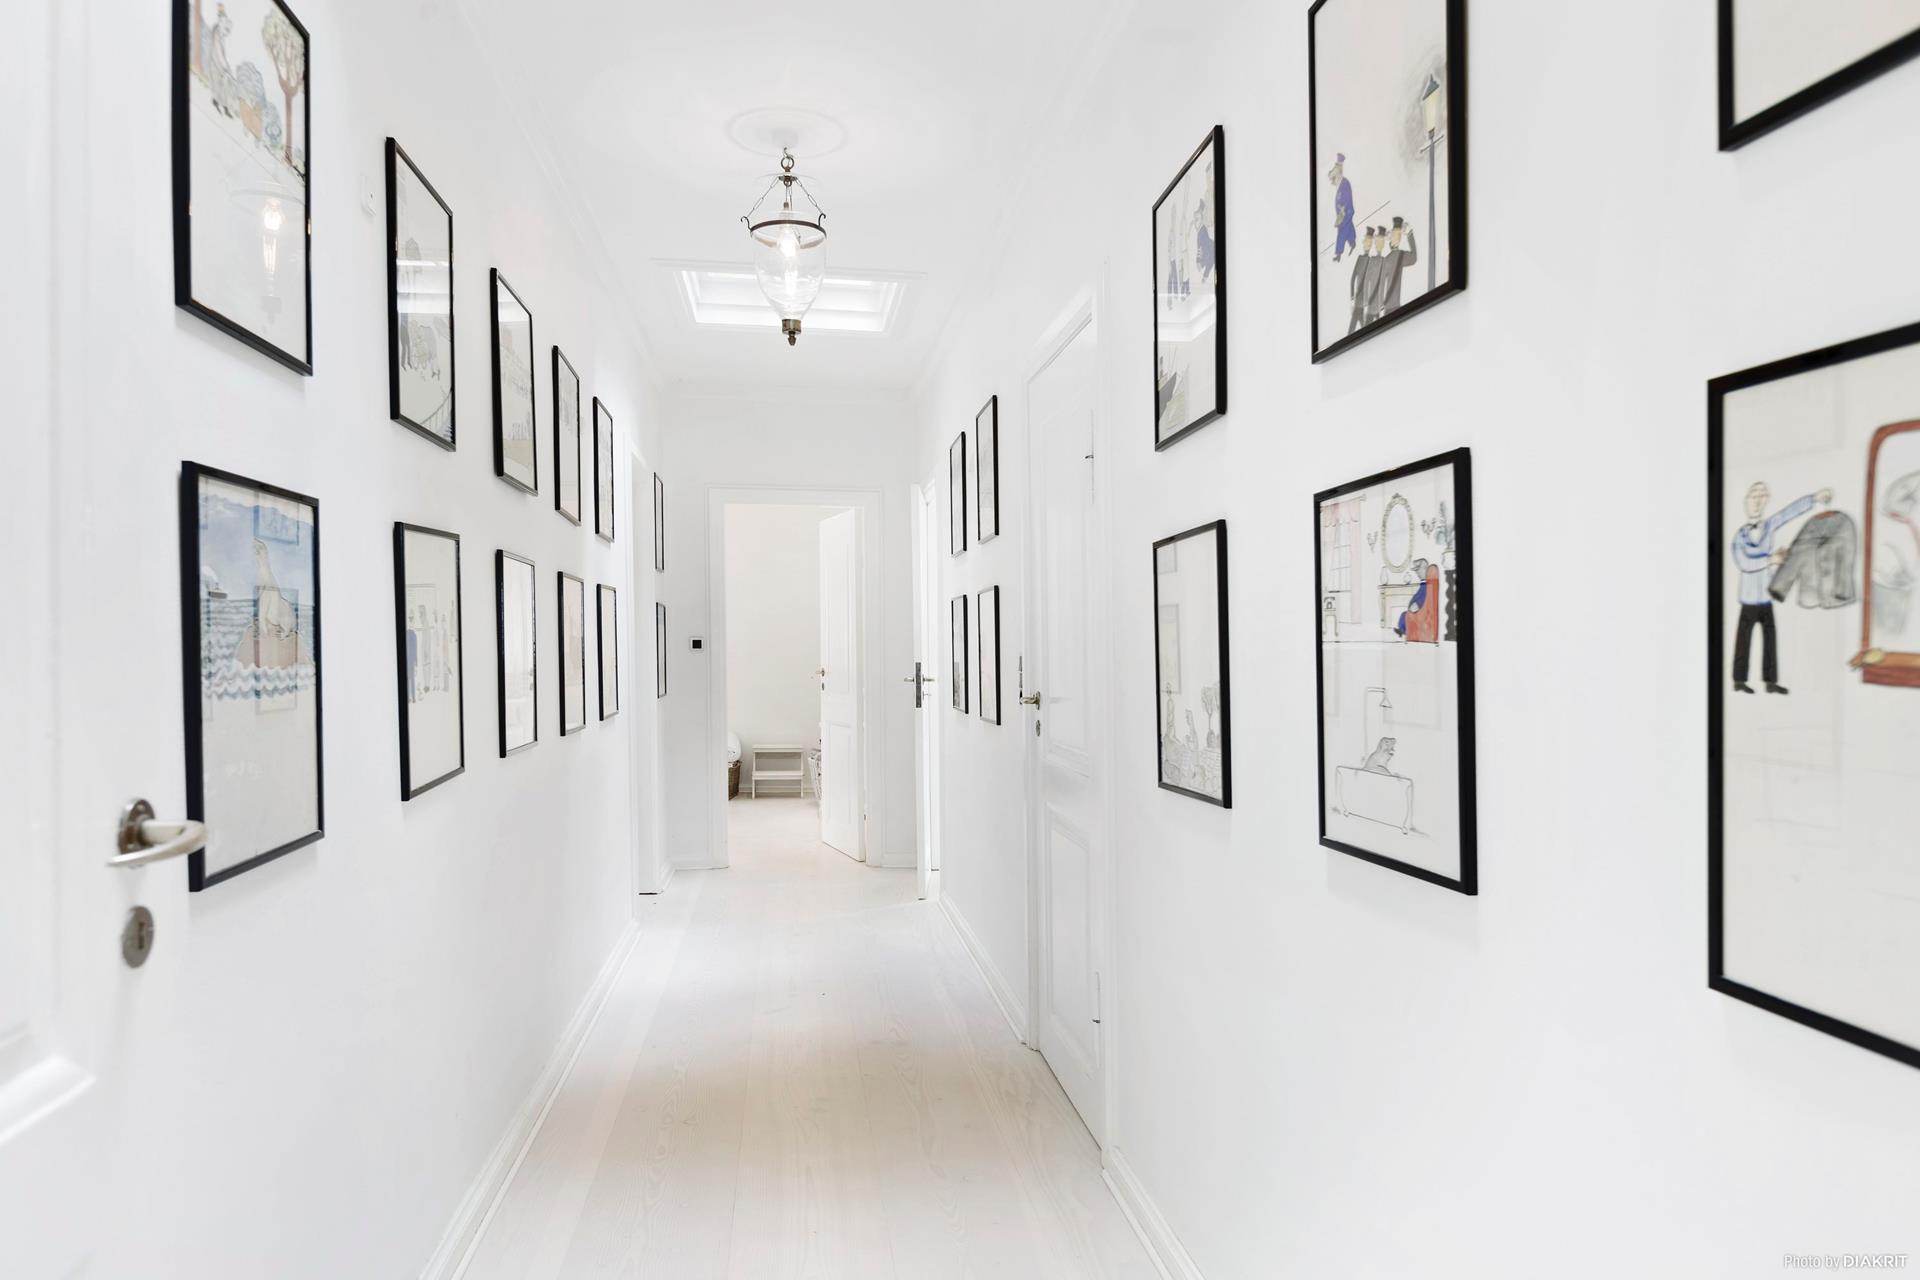 коридор галерея картины